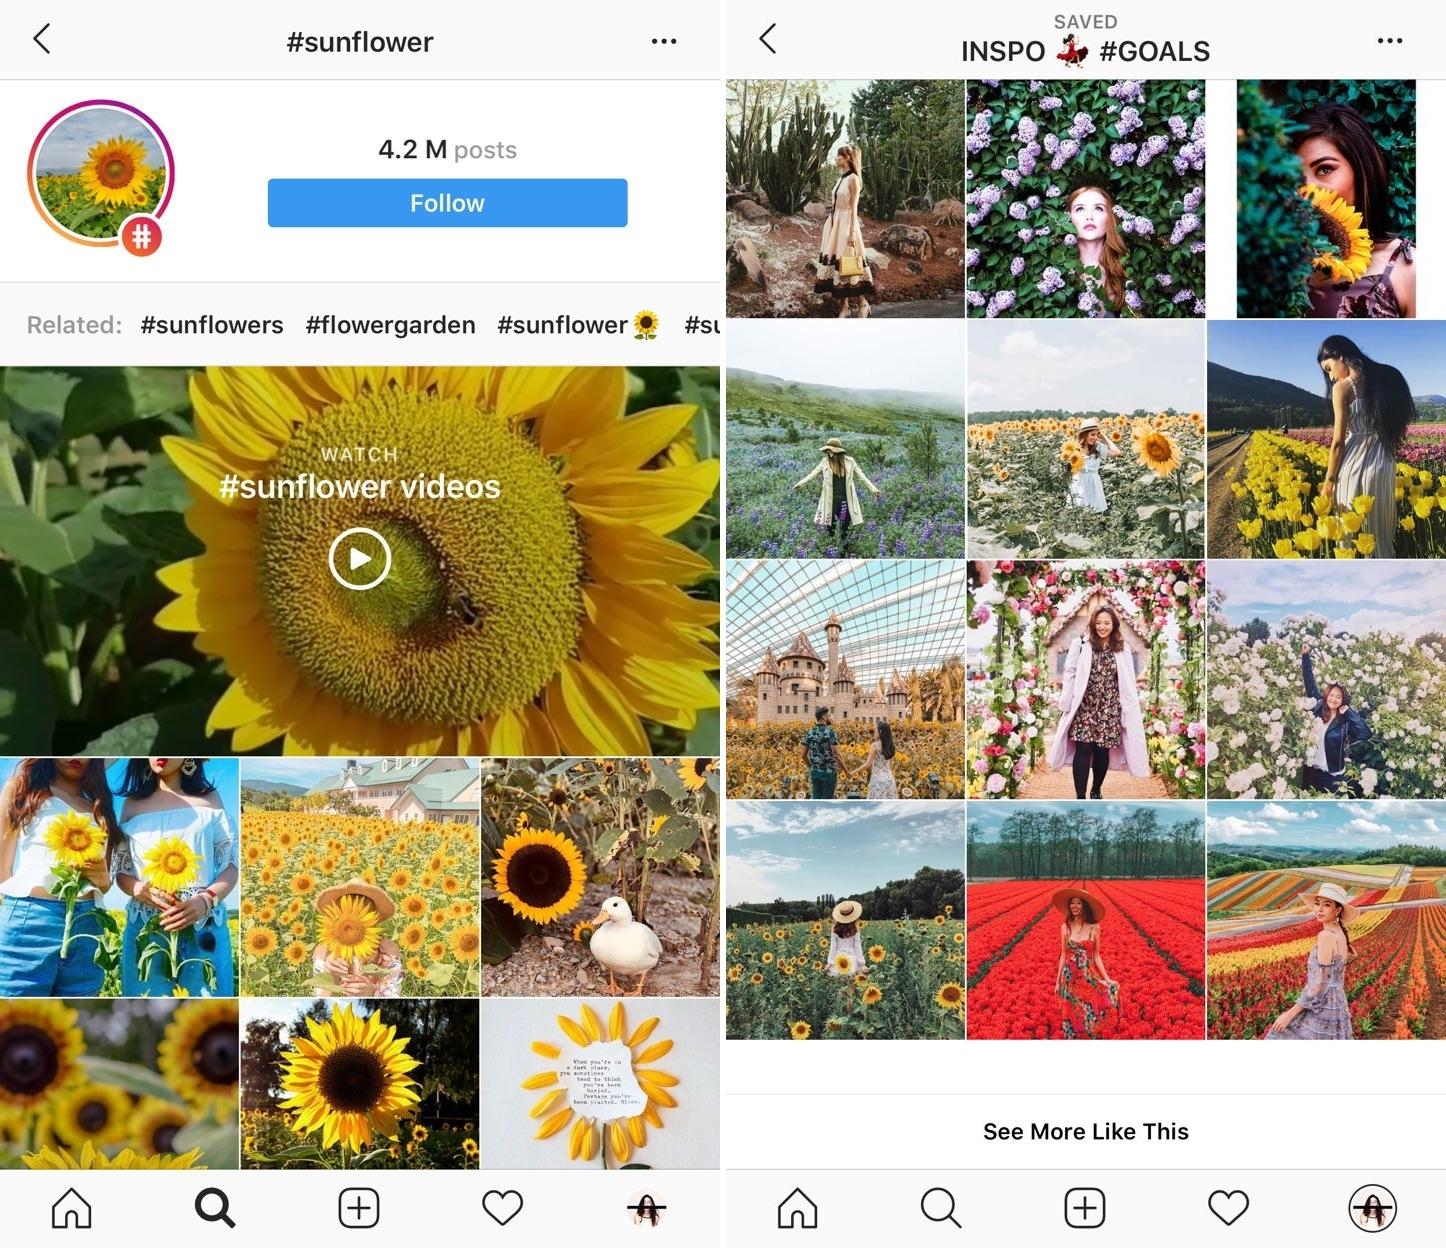 Sunflower surprise ootd using phone GBTB - instgram bookmark albums